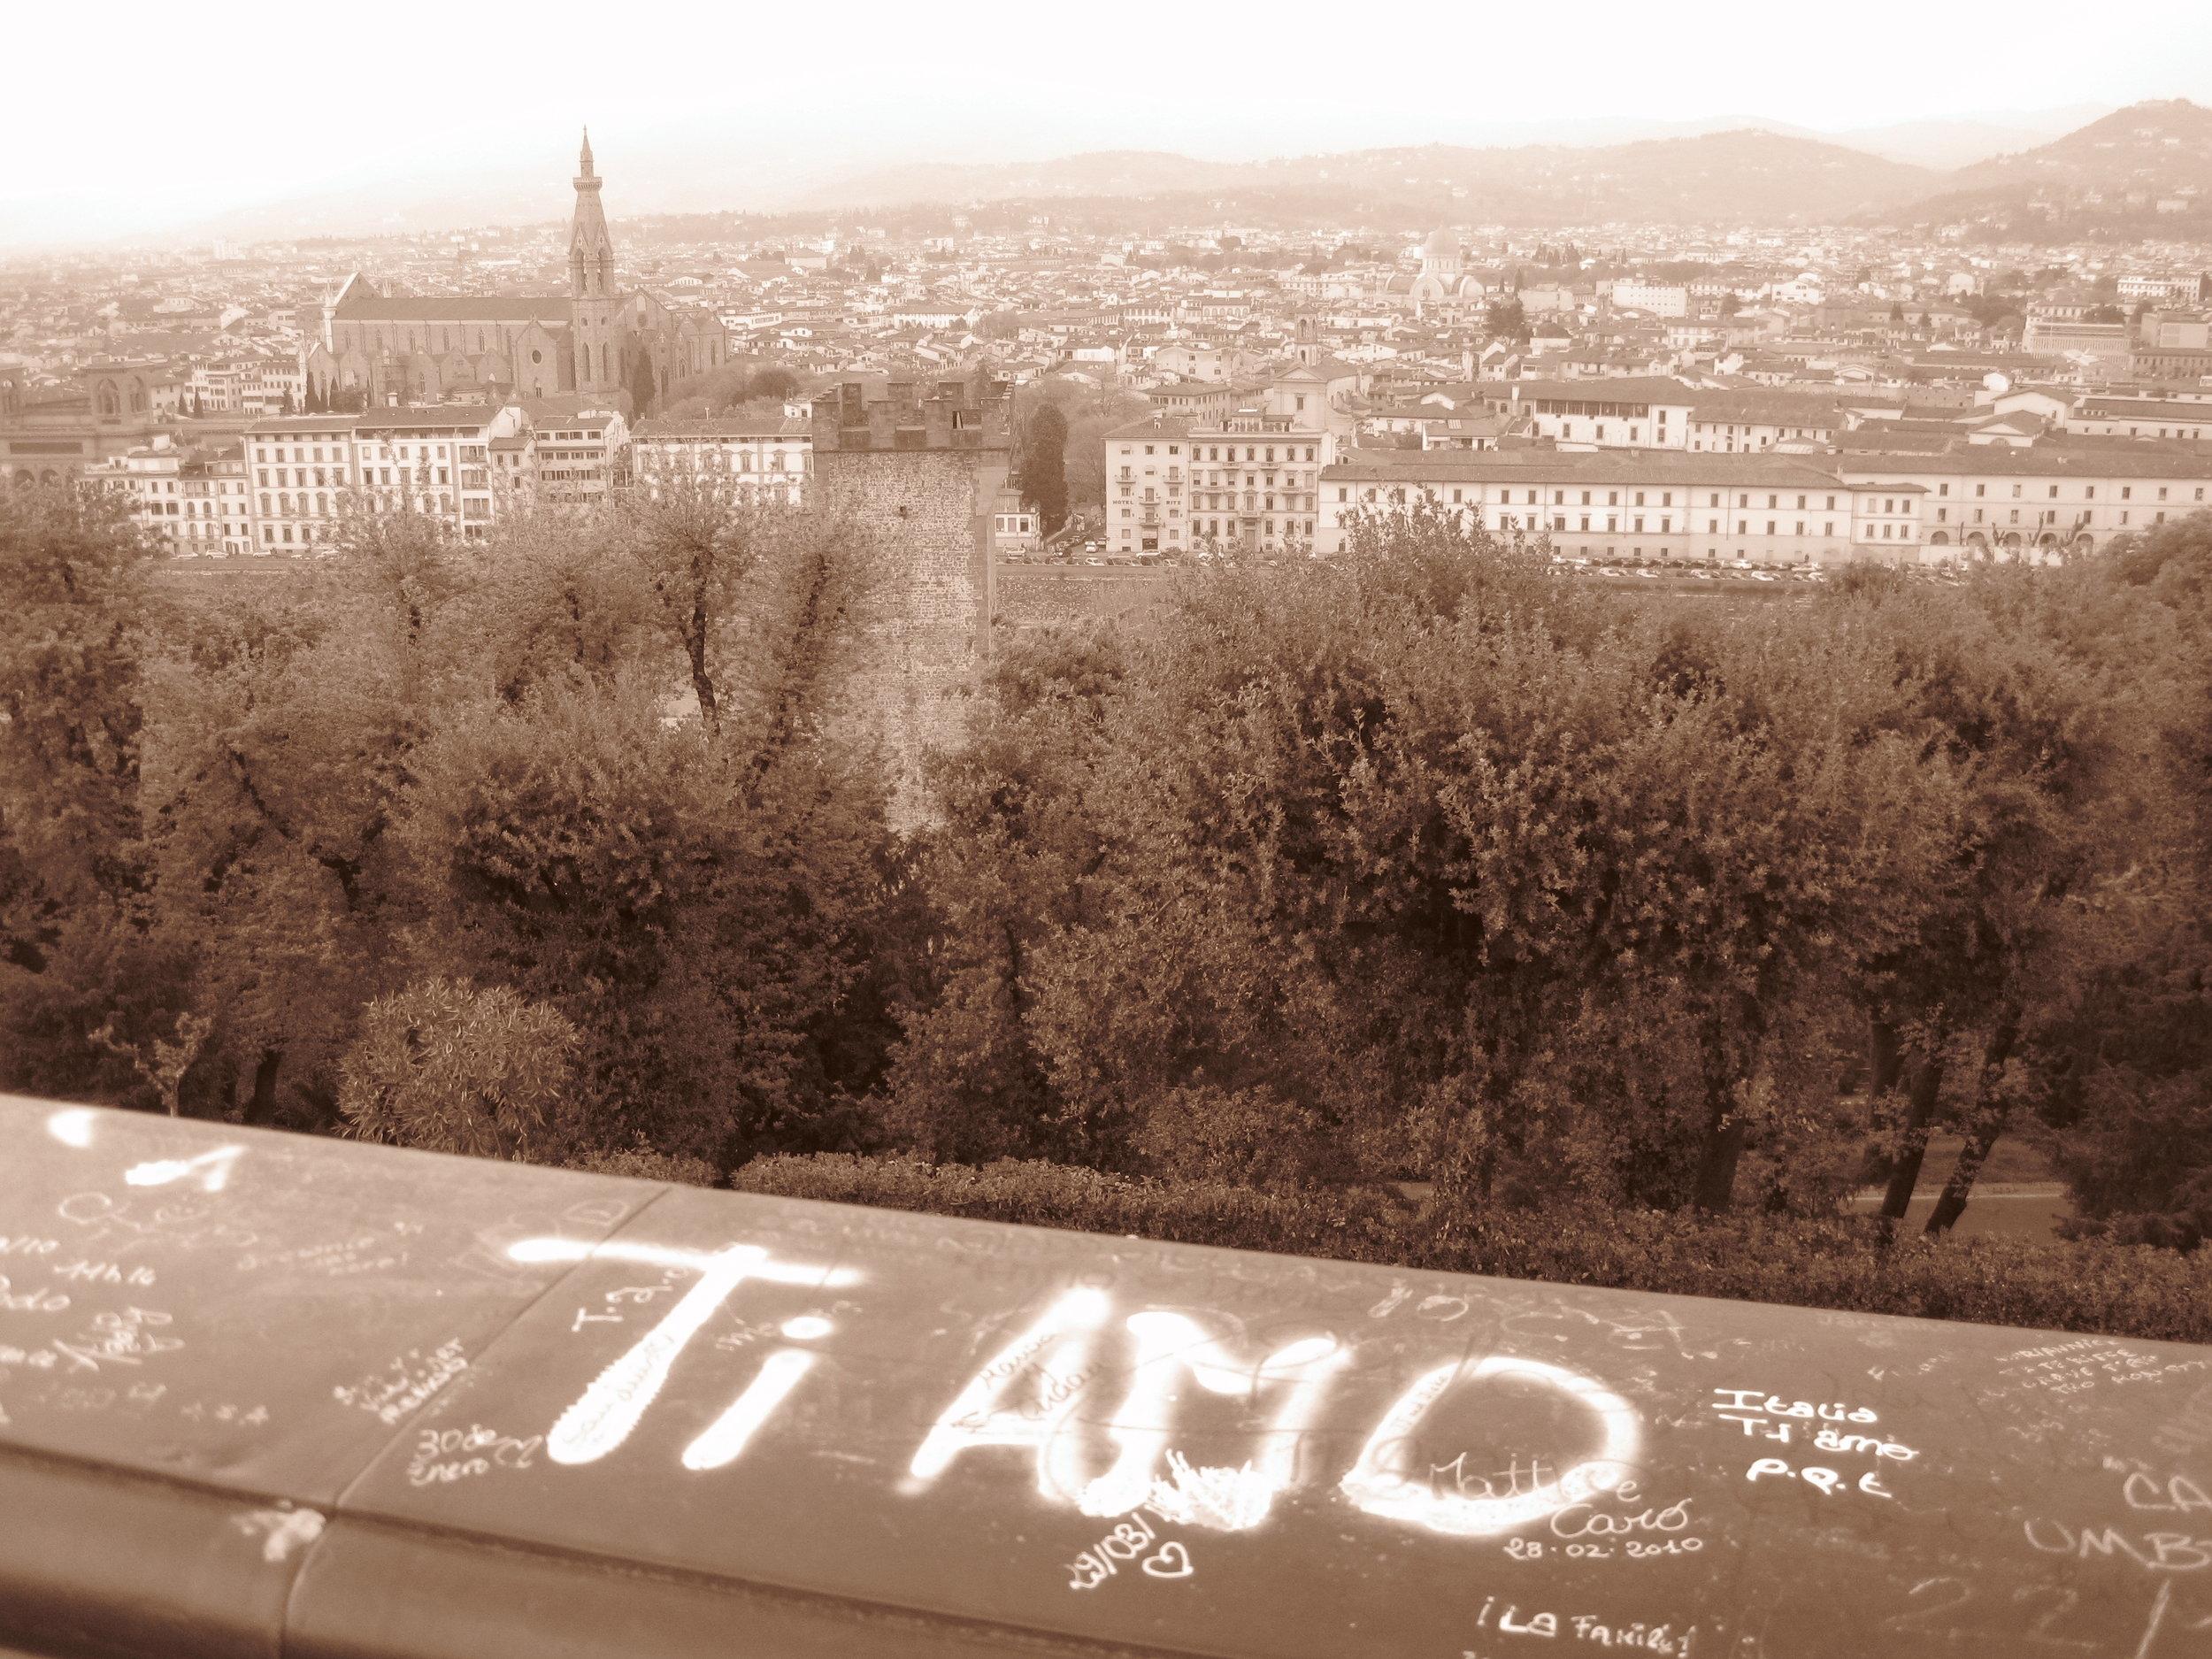 Ti Amo (I love you) - Piazzale Michelangelo